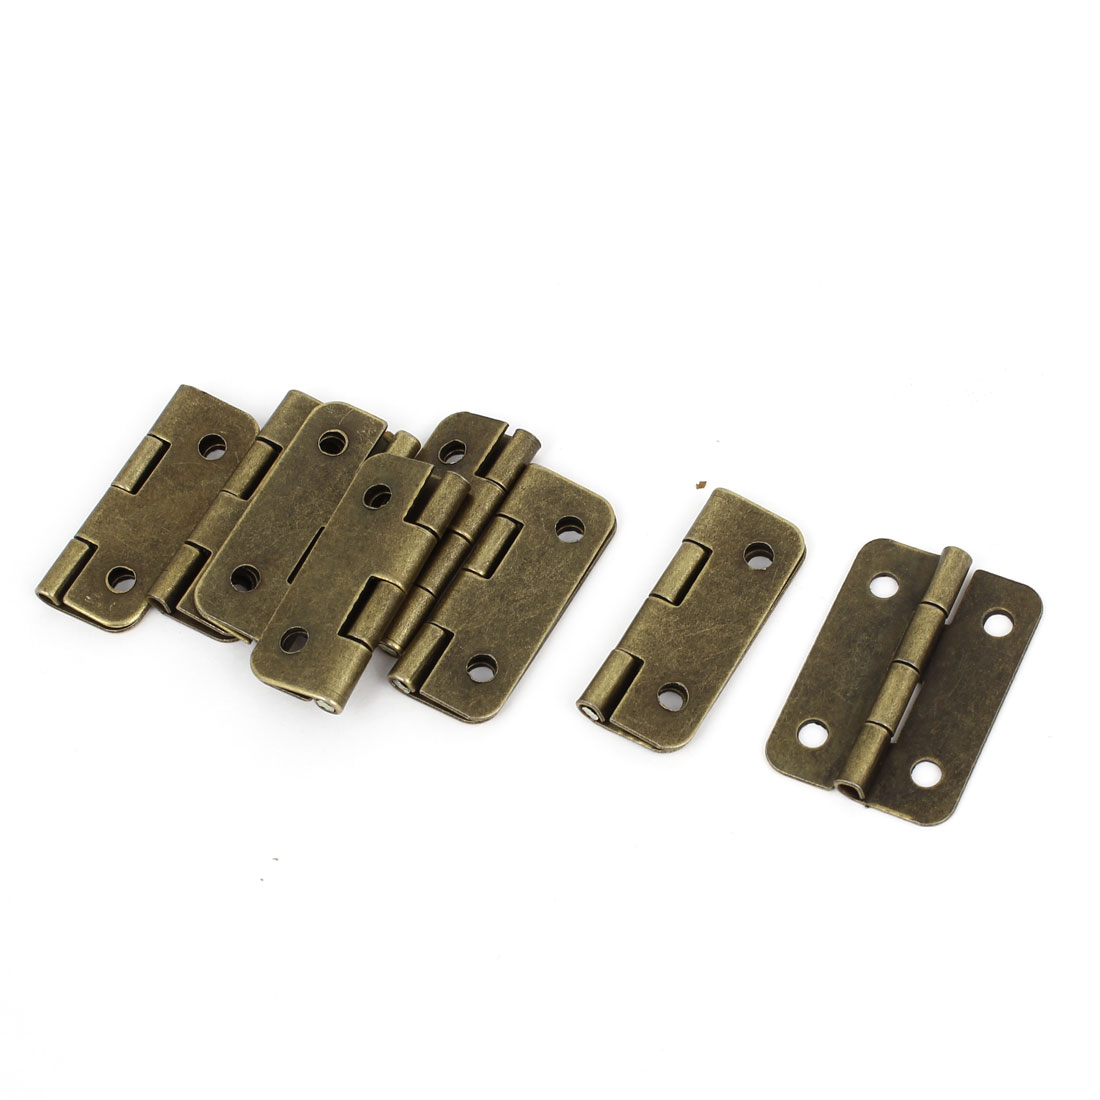 8 Pcs Bronze Tone Rotatable Drawer Dresser Door Butt Hinges 3cm Long